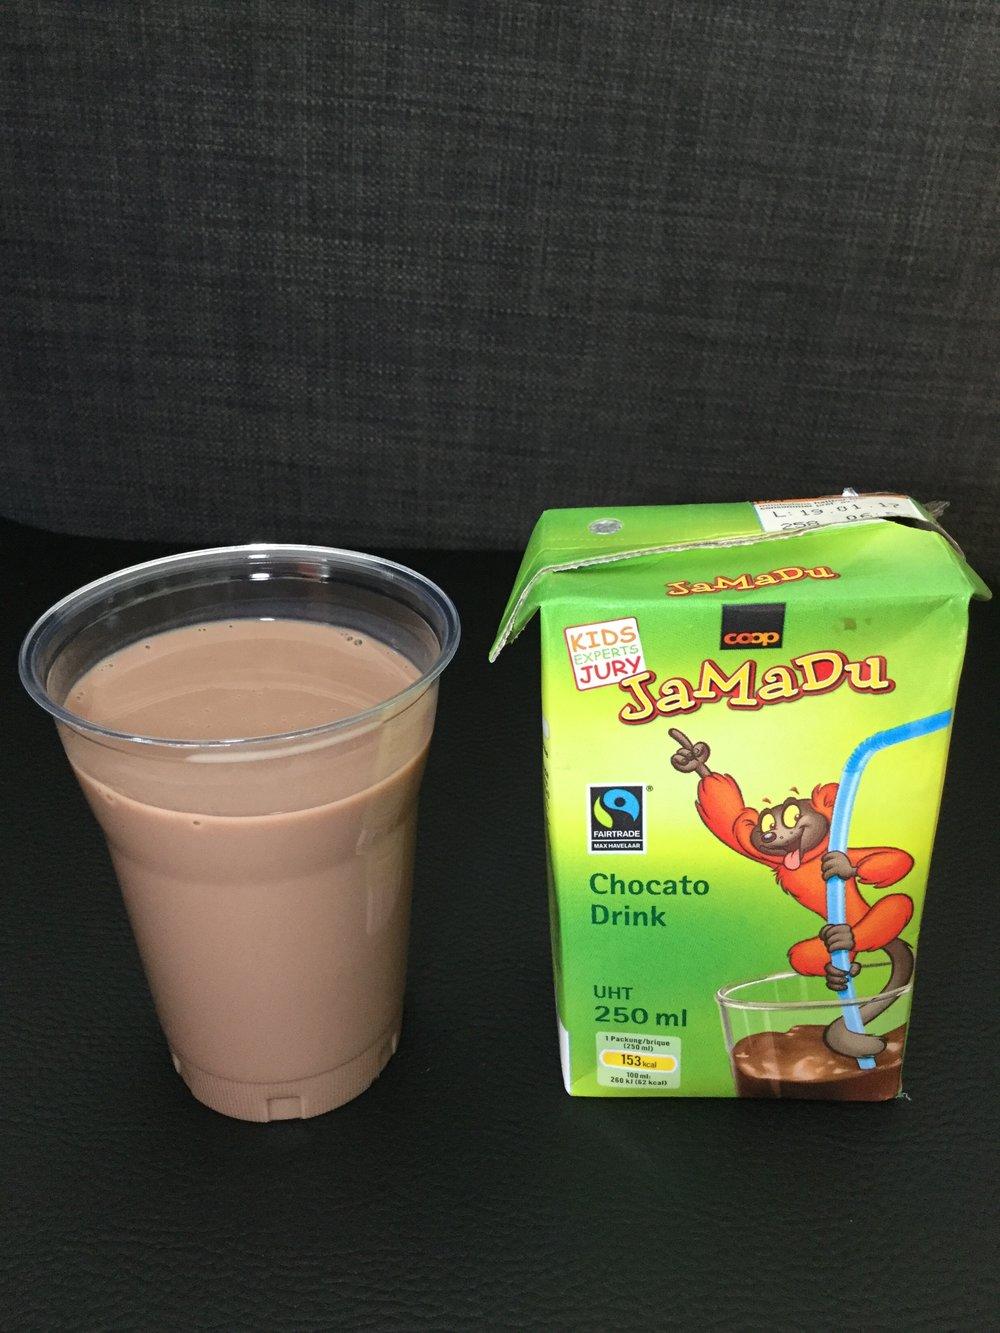 Coop Jamadu Chocato Drink Cup